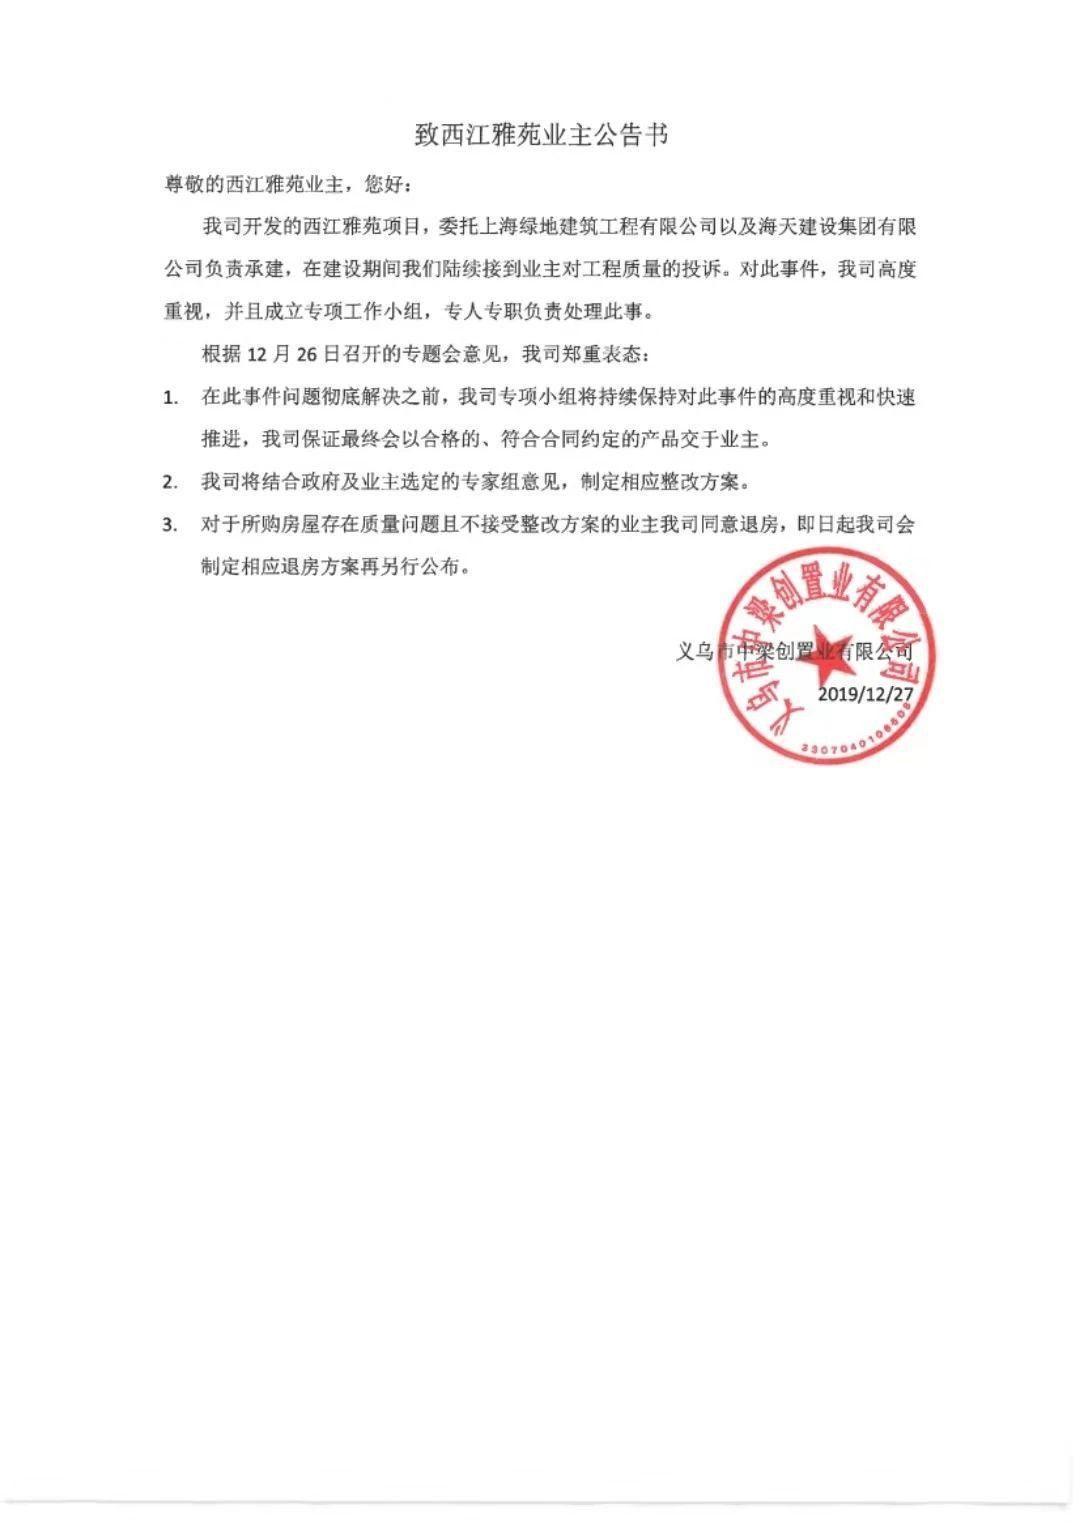 http://jszhy.cn/fangchan/180287.html